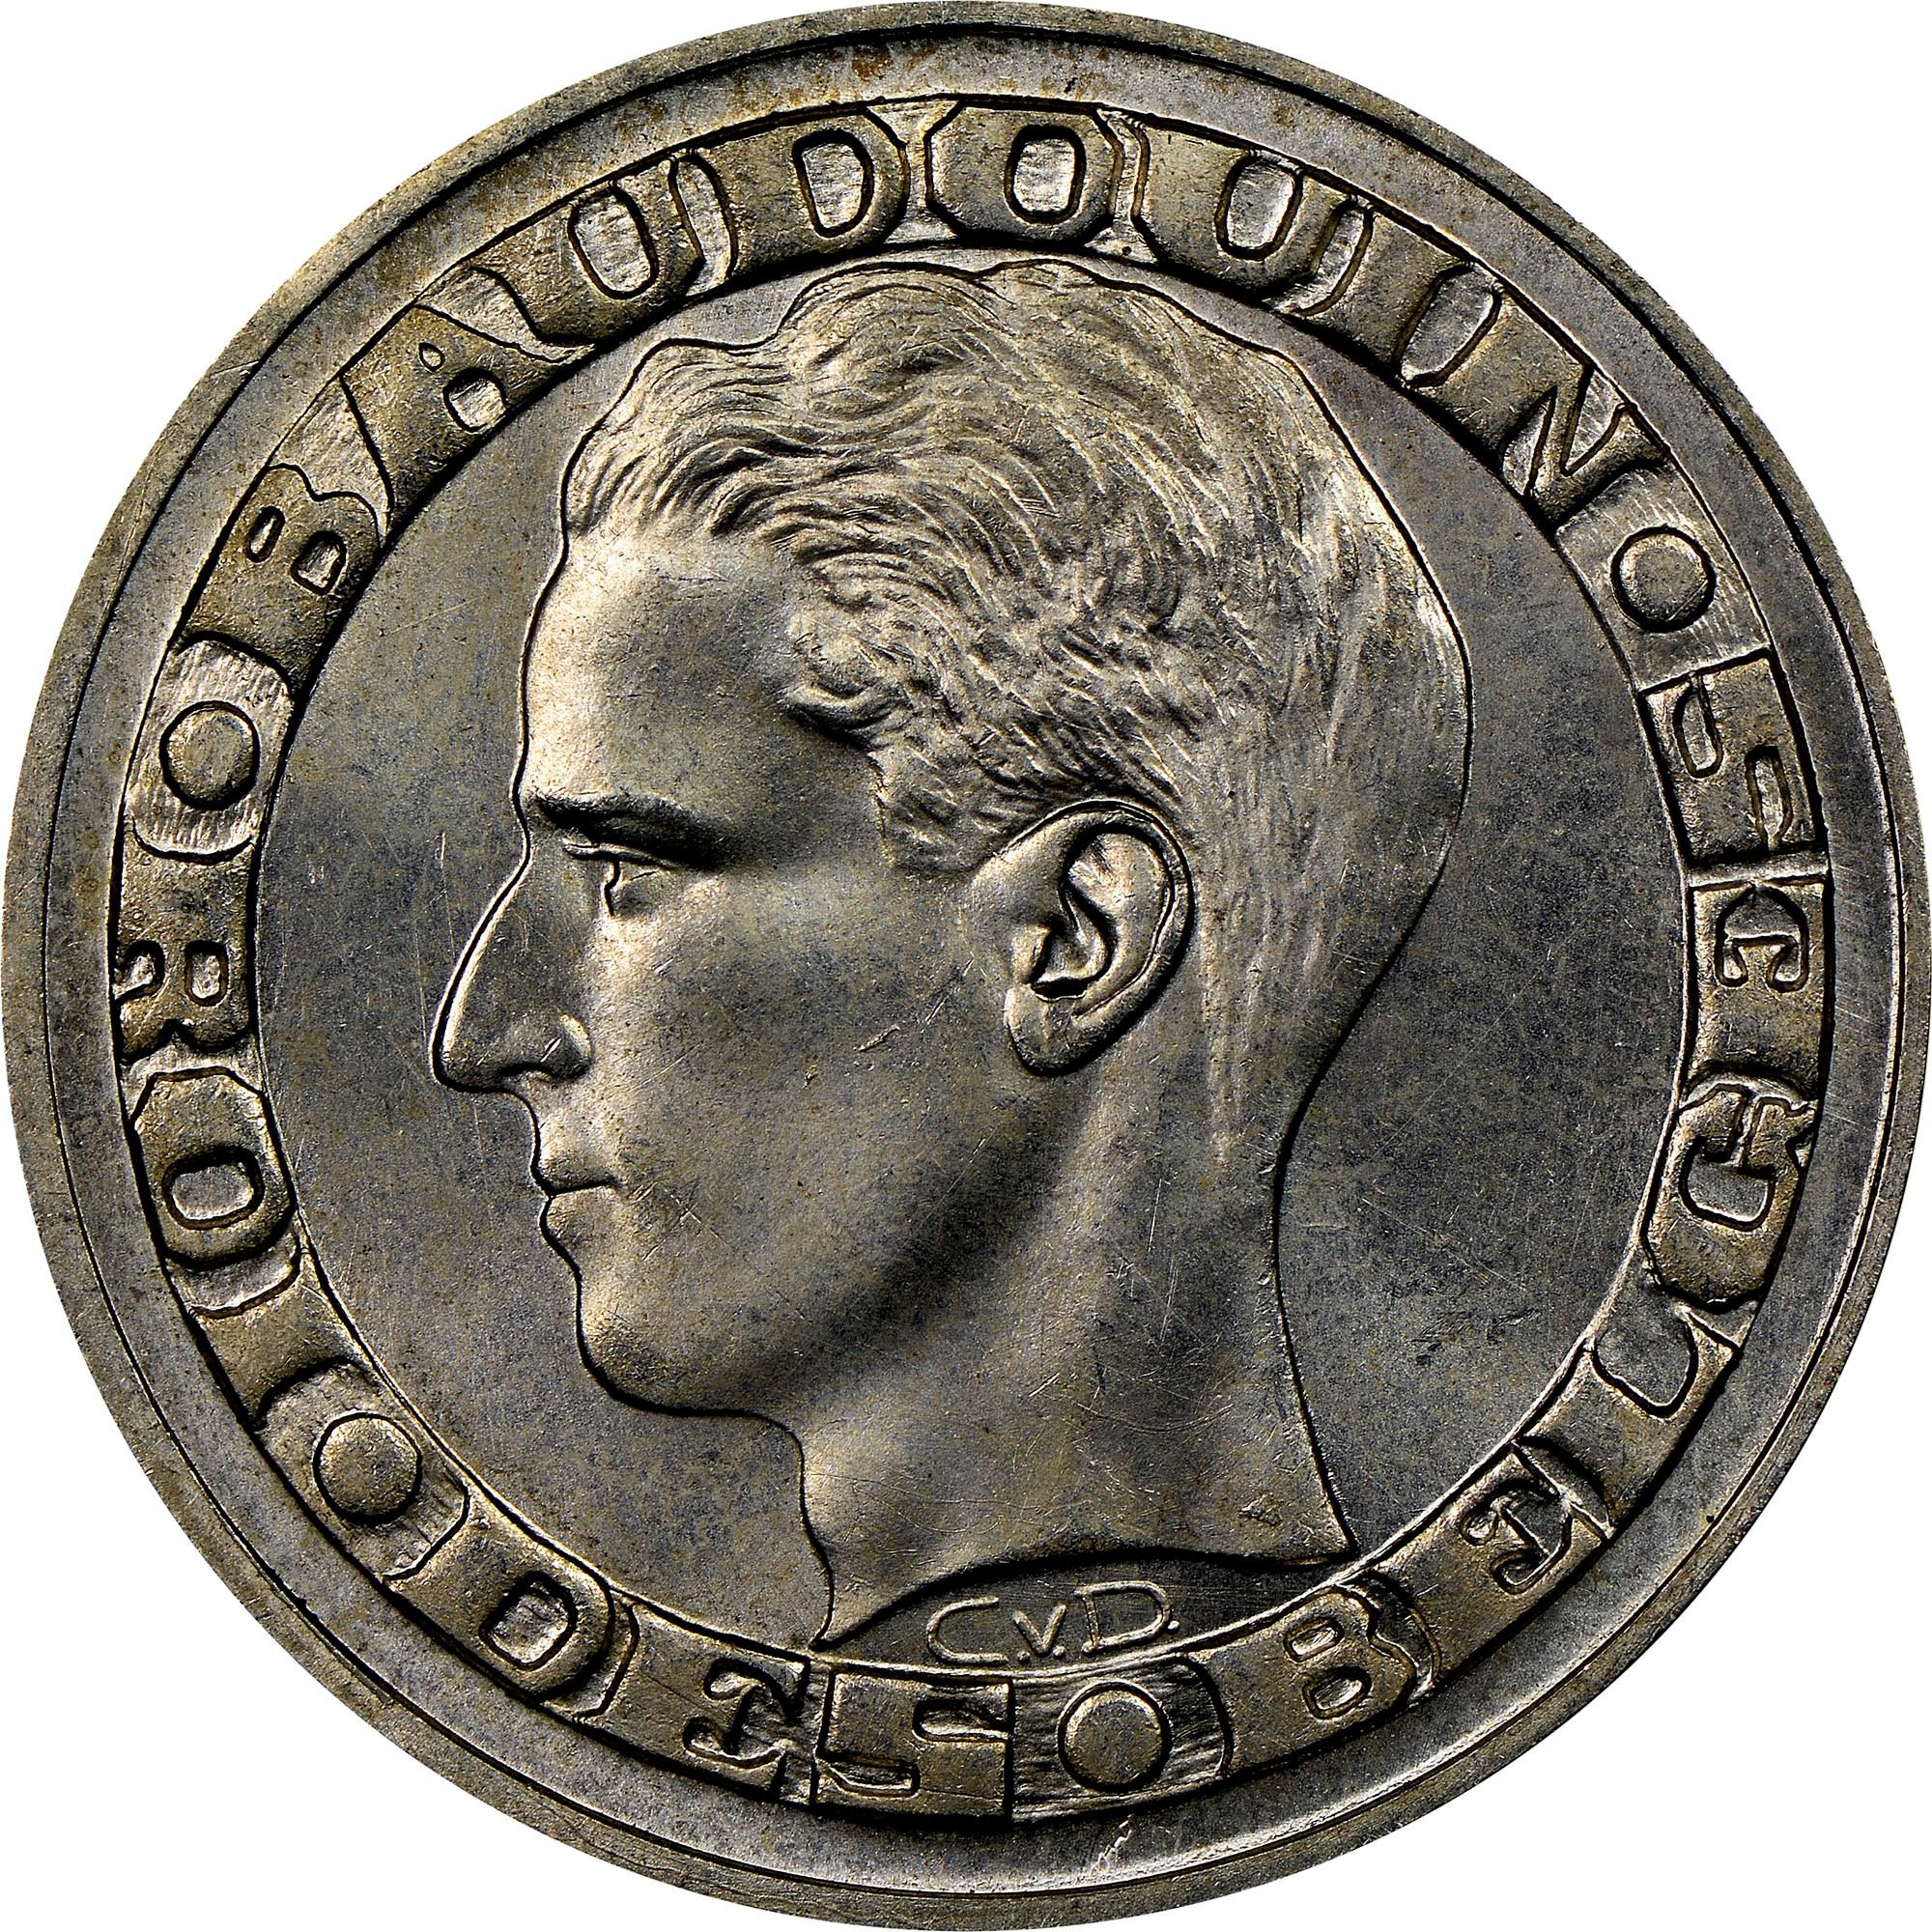 Belgium 50 Francs obverse